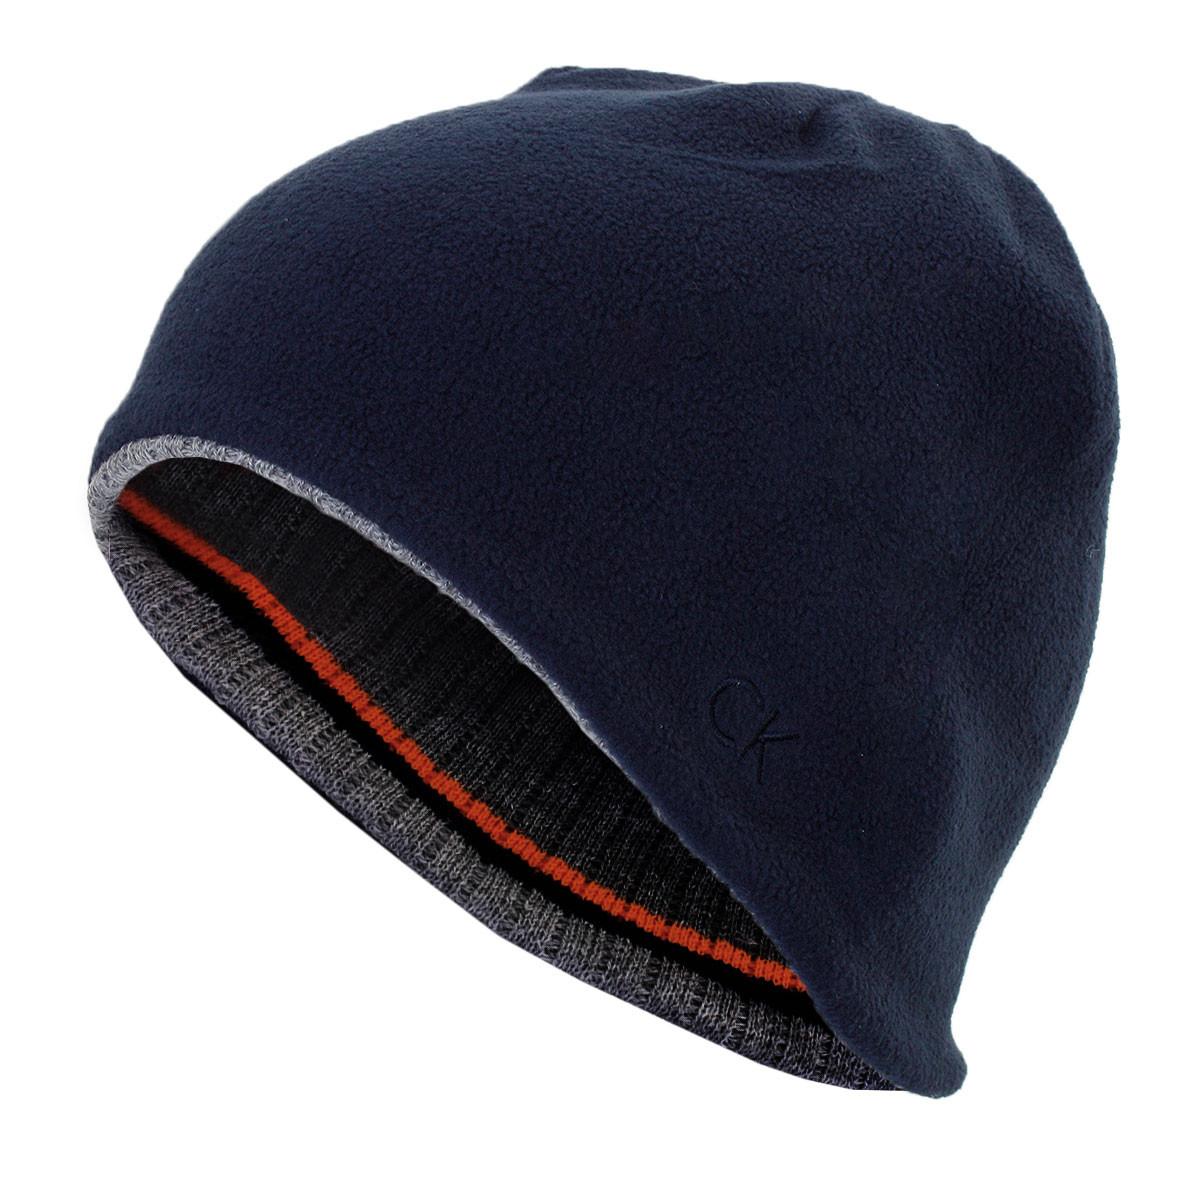 5b18eb03 Home · Men; Calvin Klein Golf Mens Reversible Knit Beanie. < Back. prev